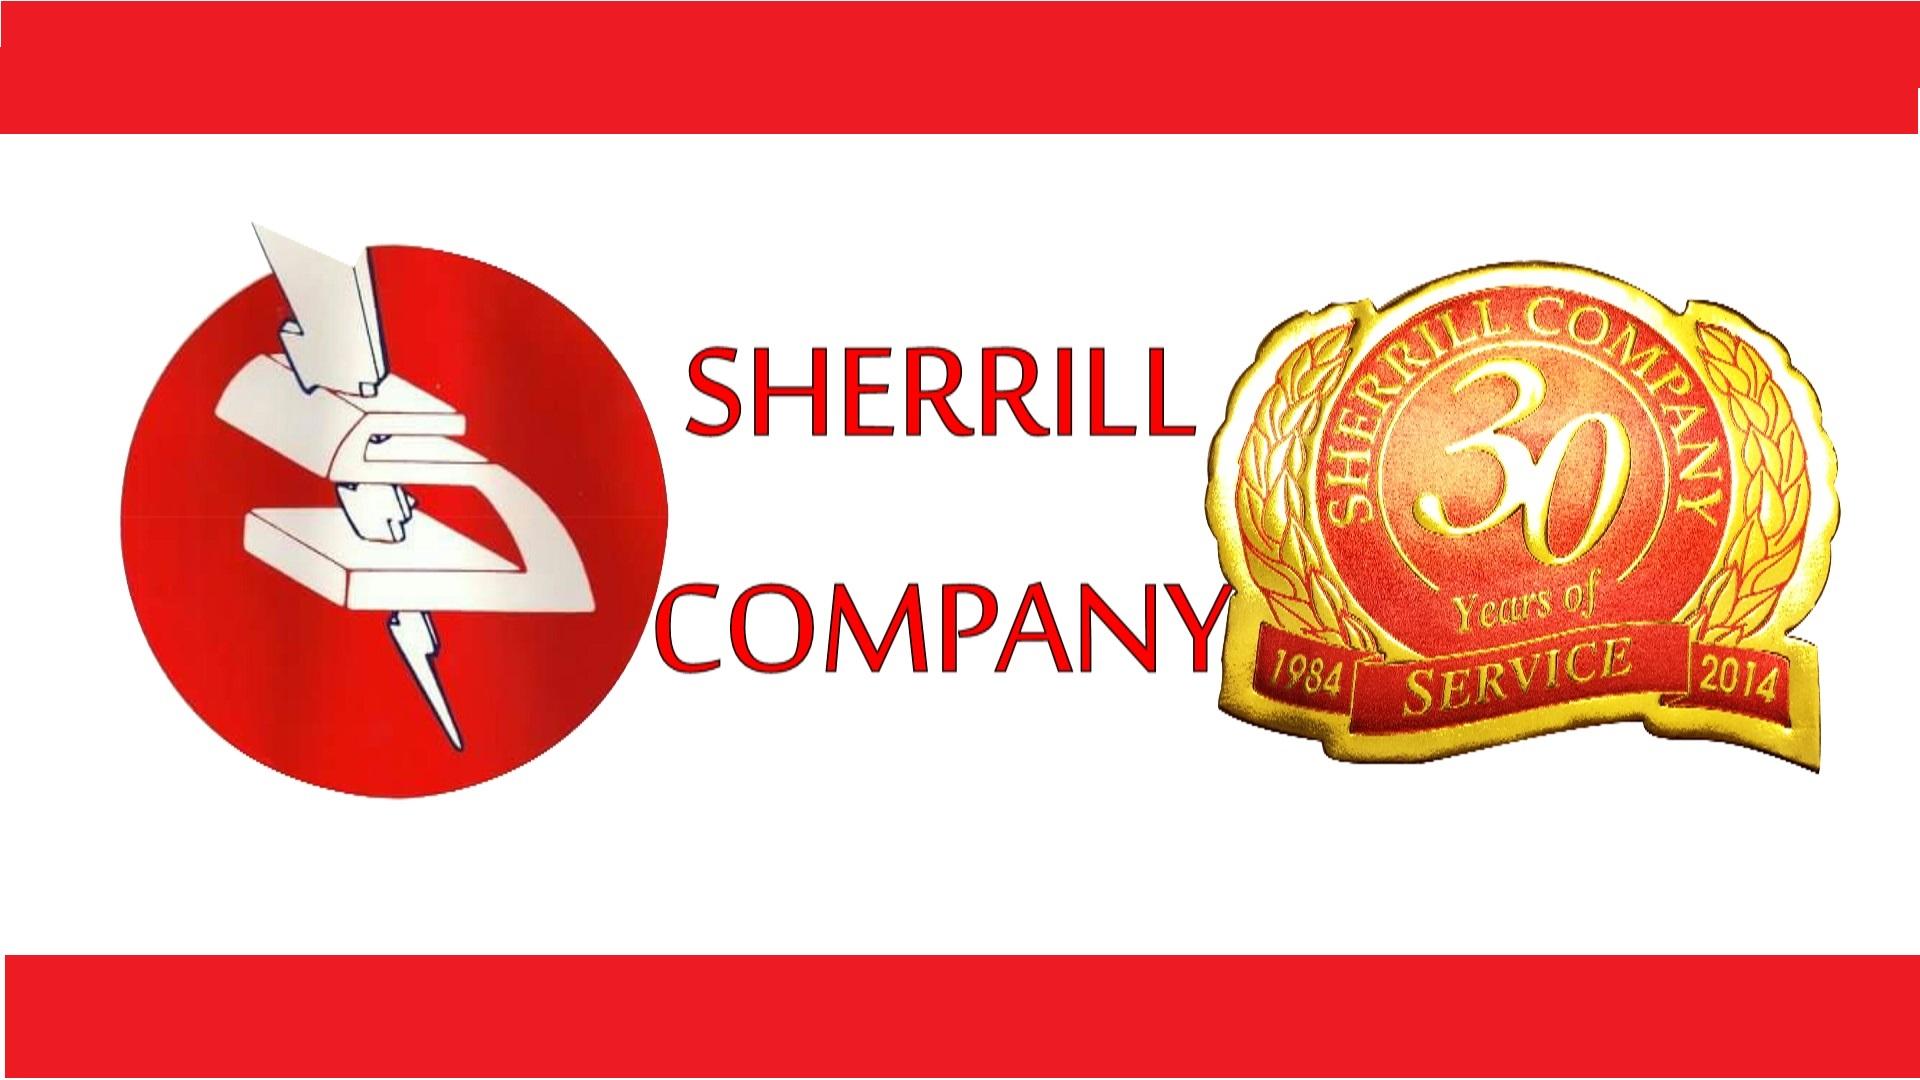 Sherrill co